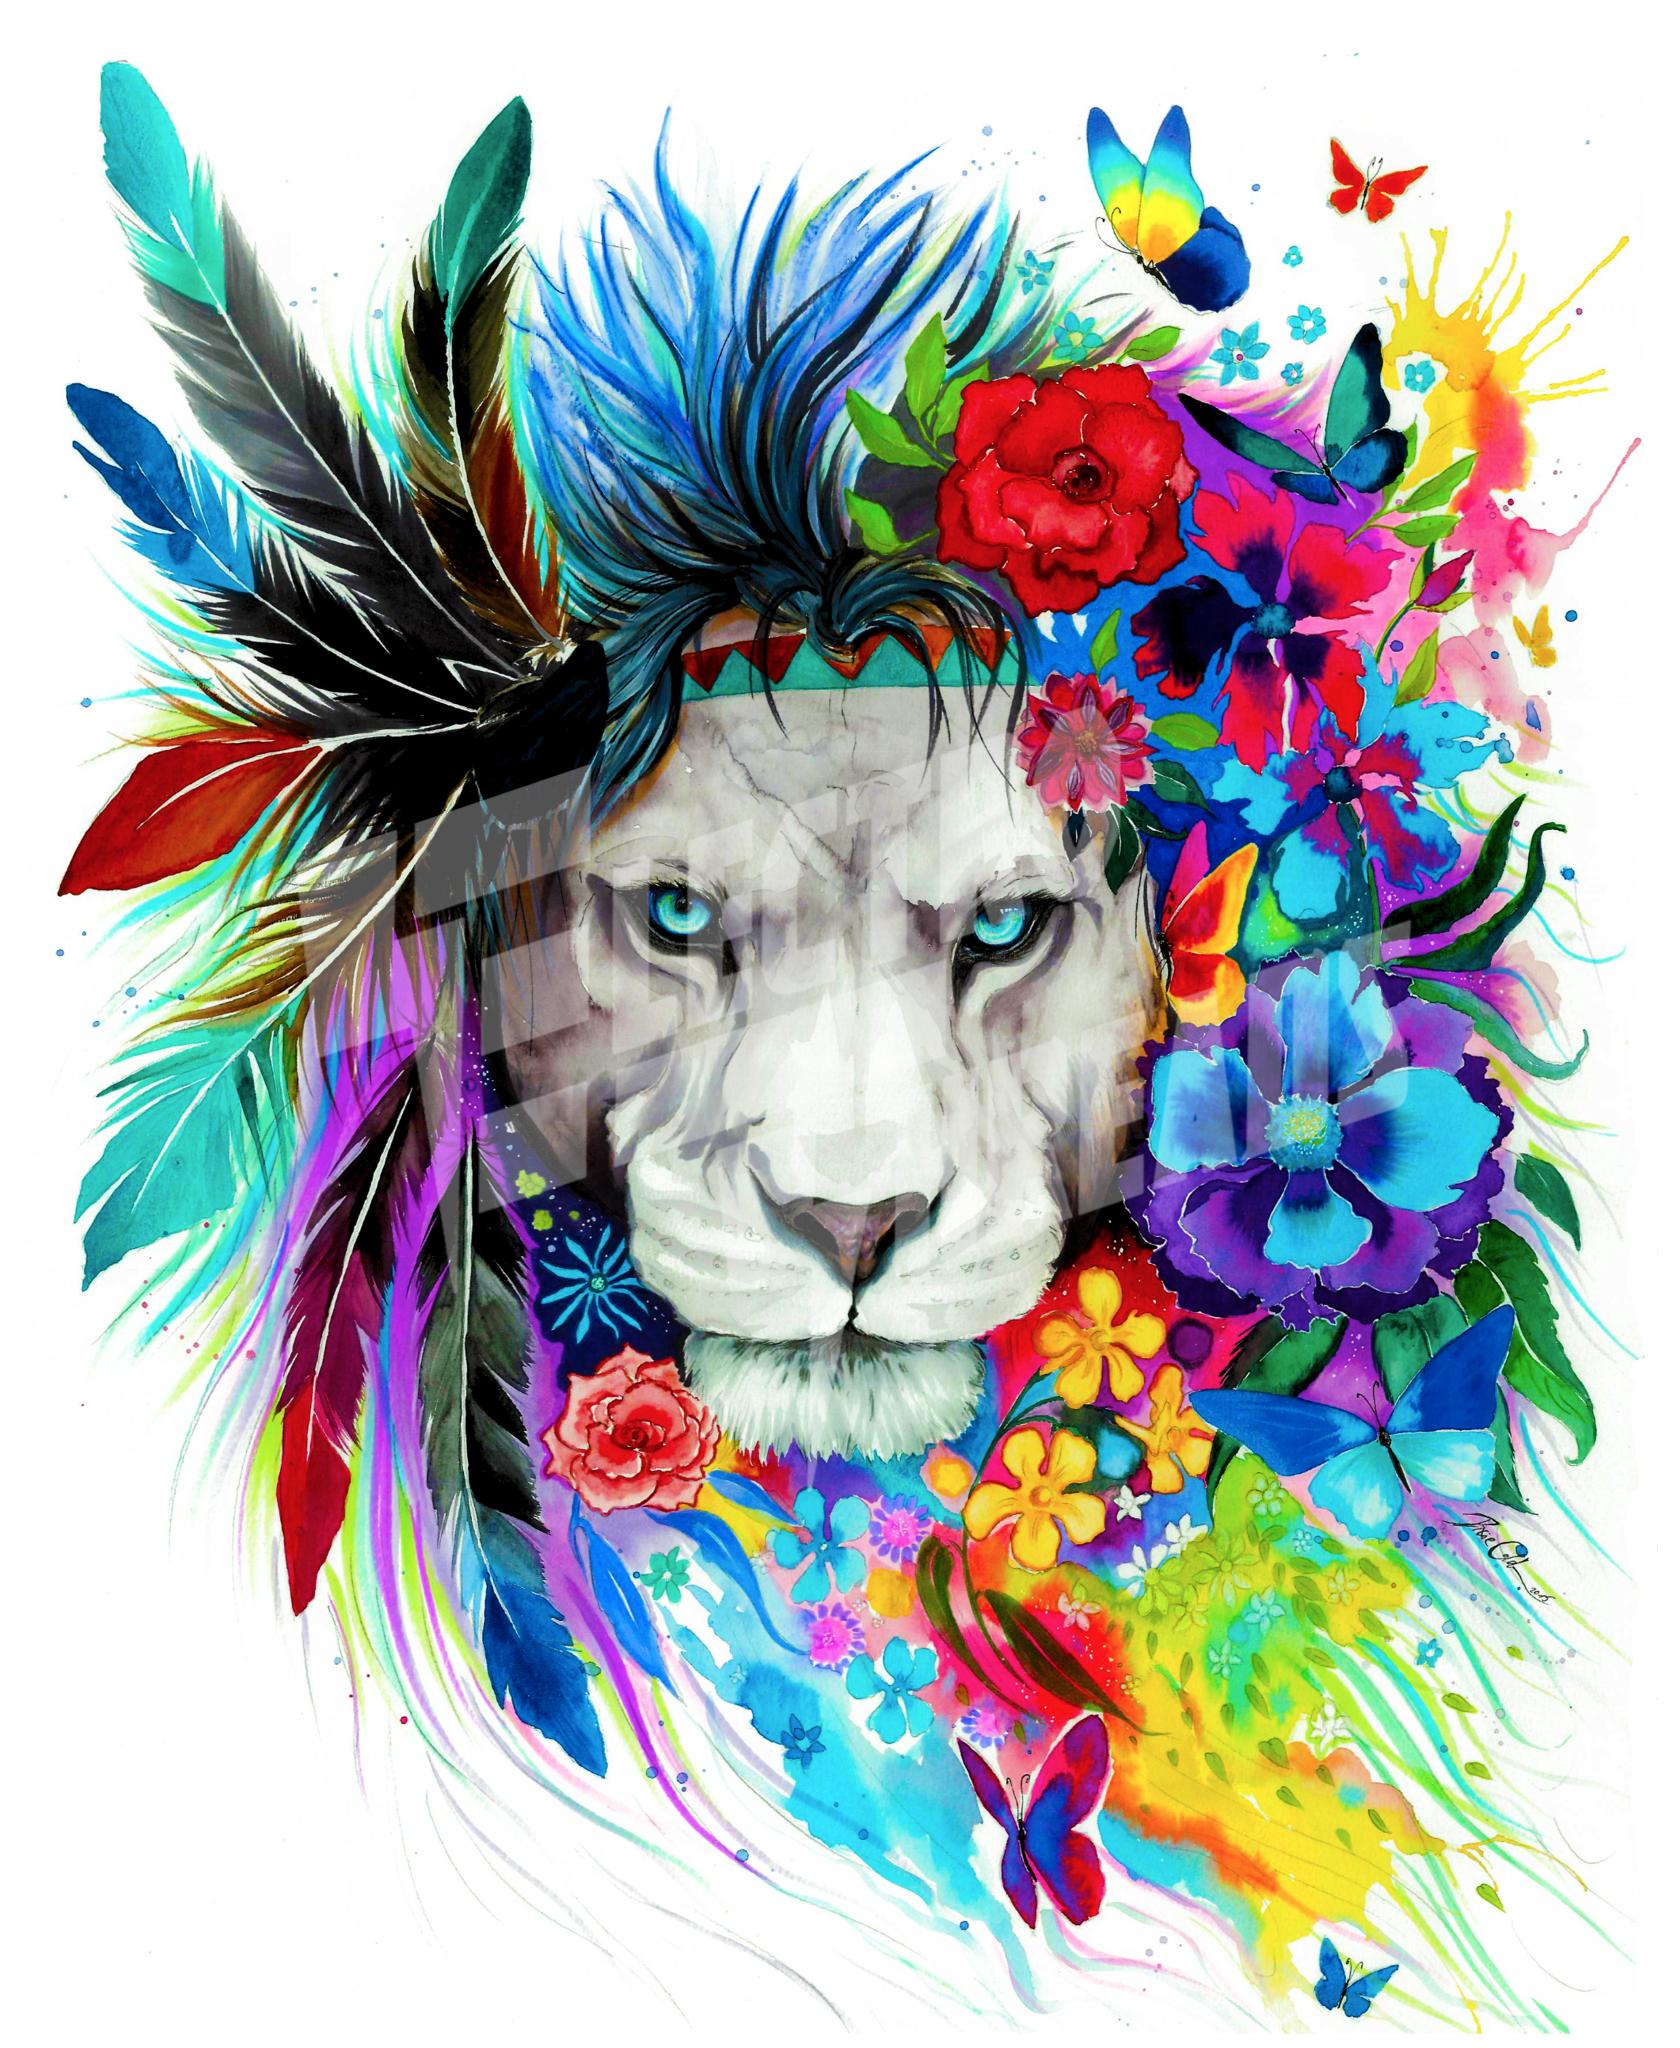 King of Lions Blanket | Leones, León y Lion